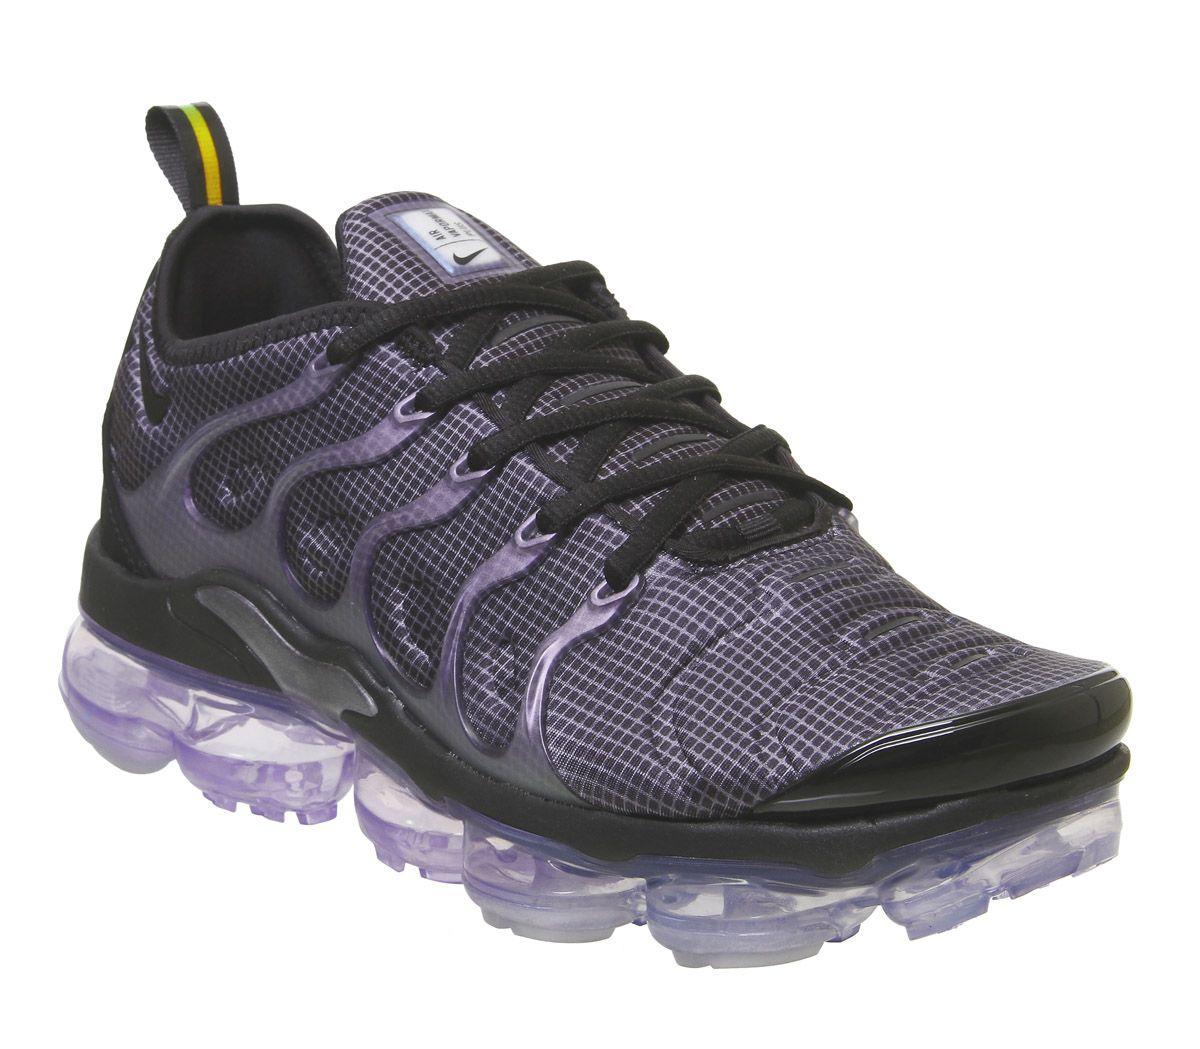 d36f83b183 Nike Vapormax Air Vapormax Plus Trainers Black Black Dark Grey ...